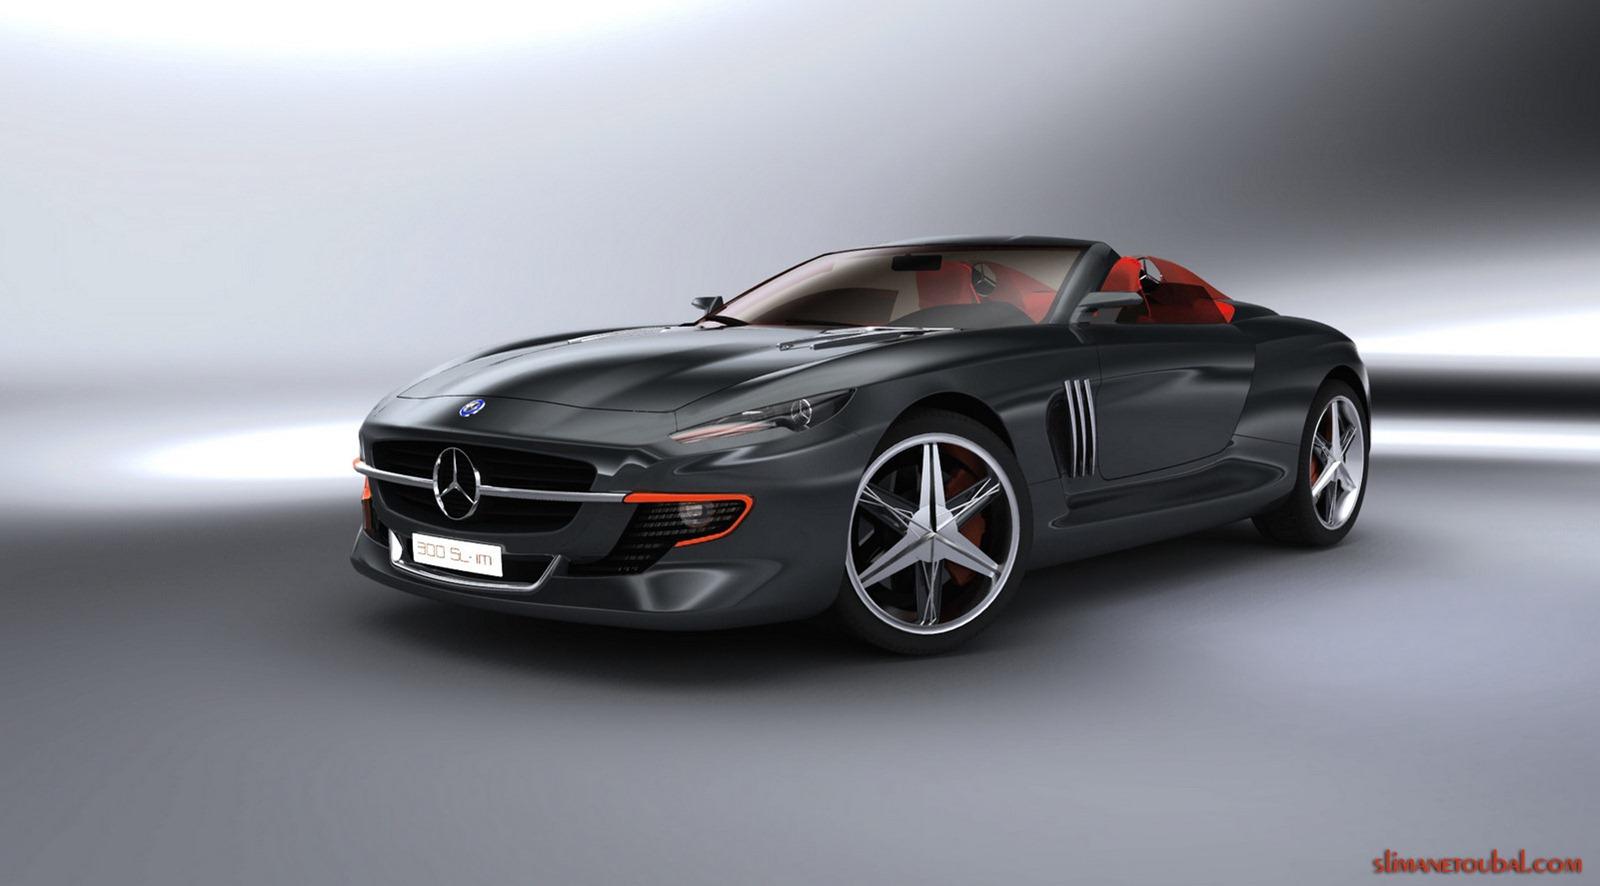 MercedesBenz Concept Cars 2015